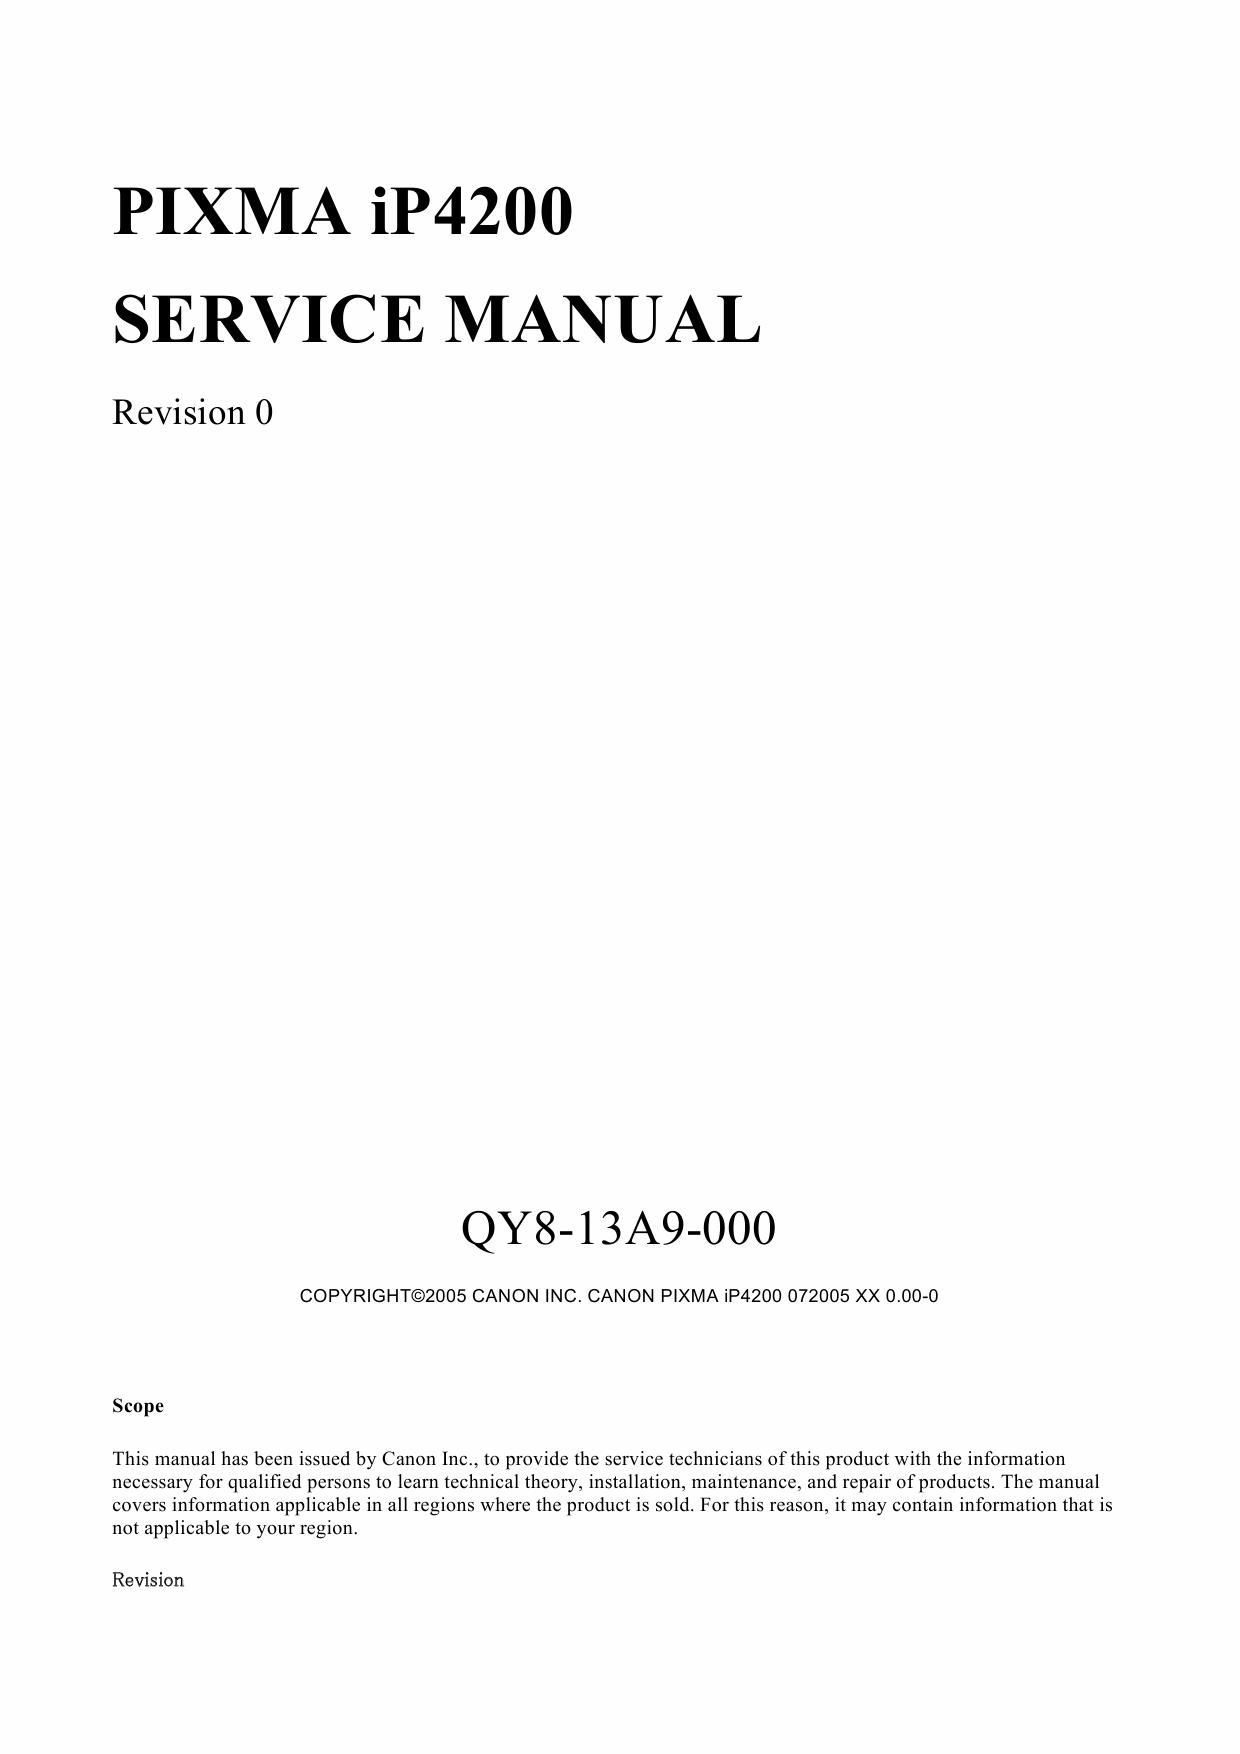 canon pixma ip4200 manual pdf